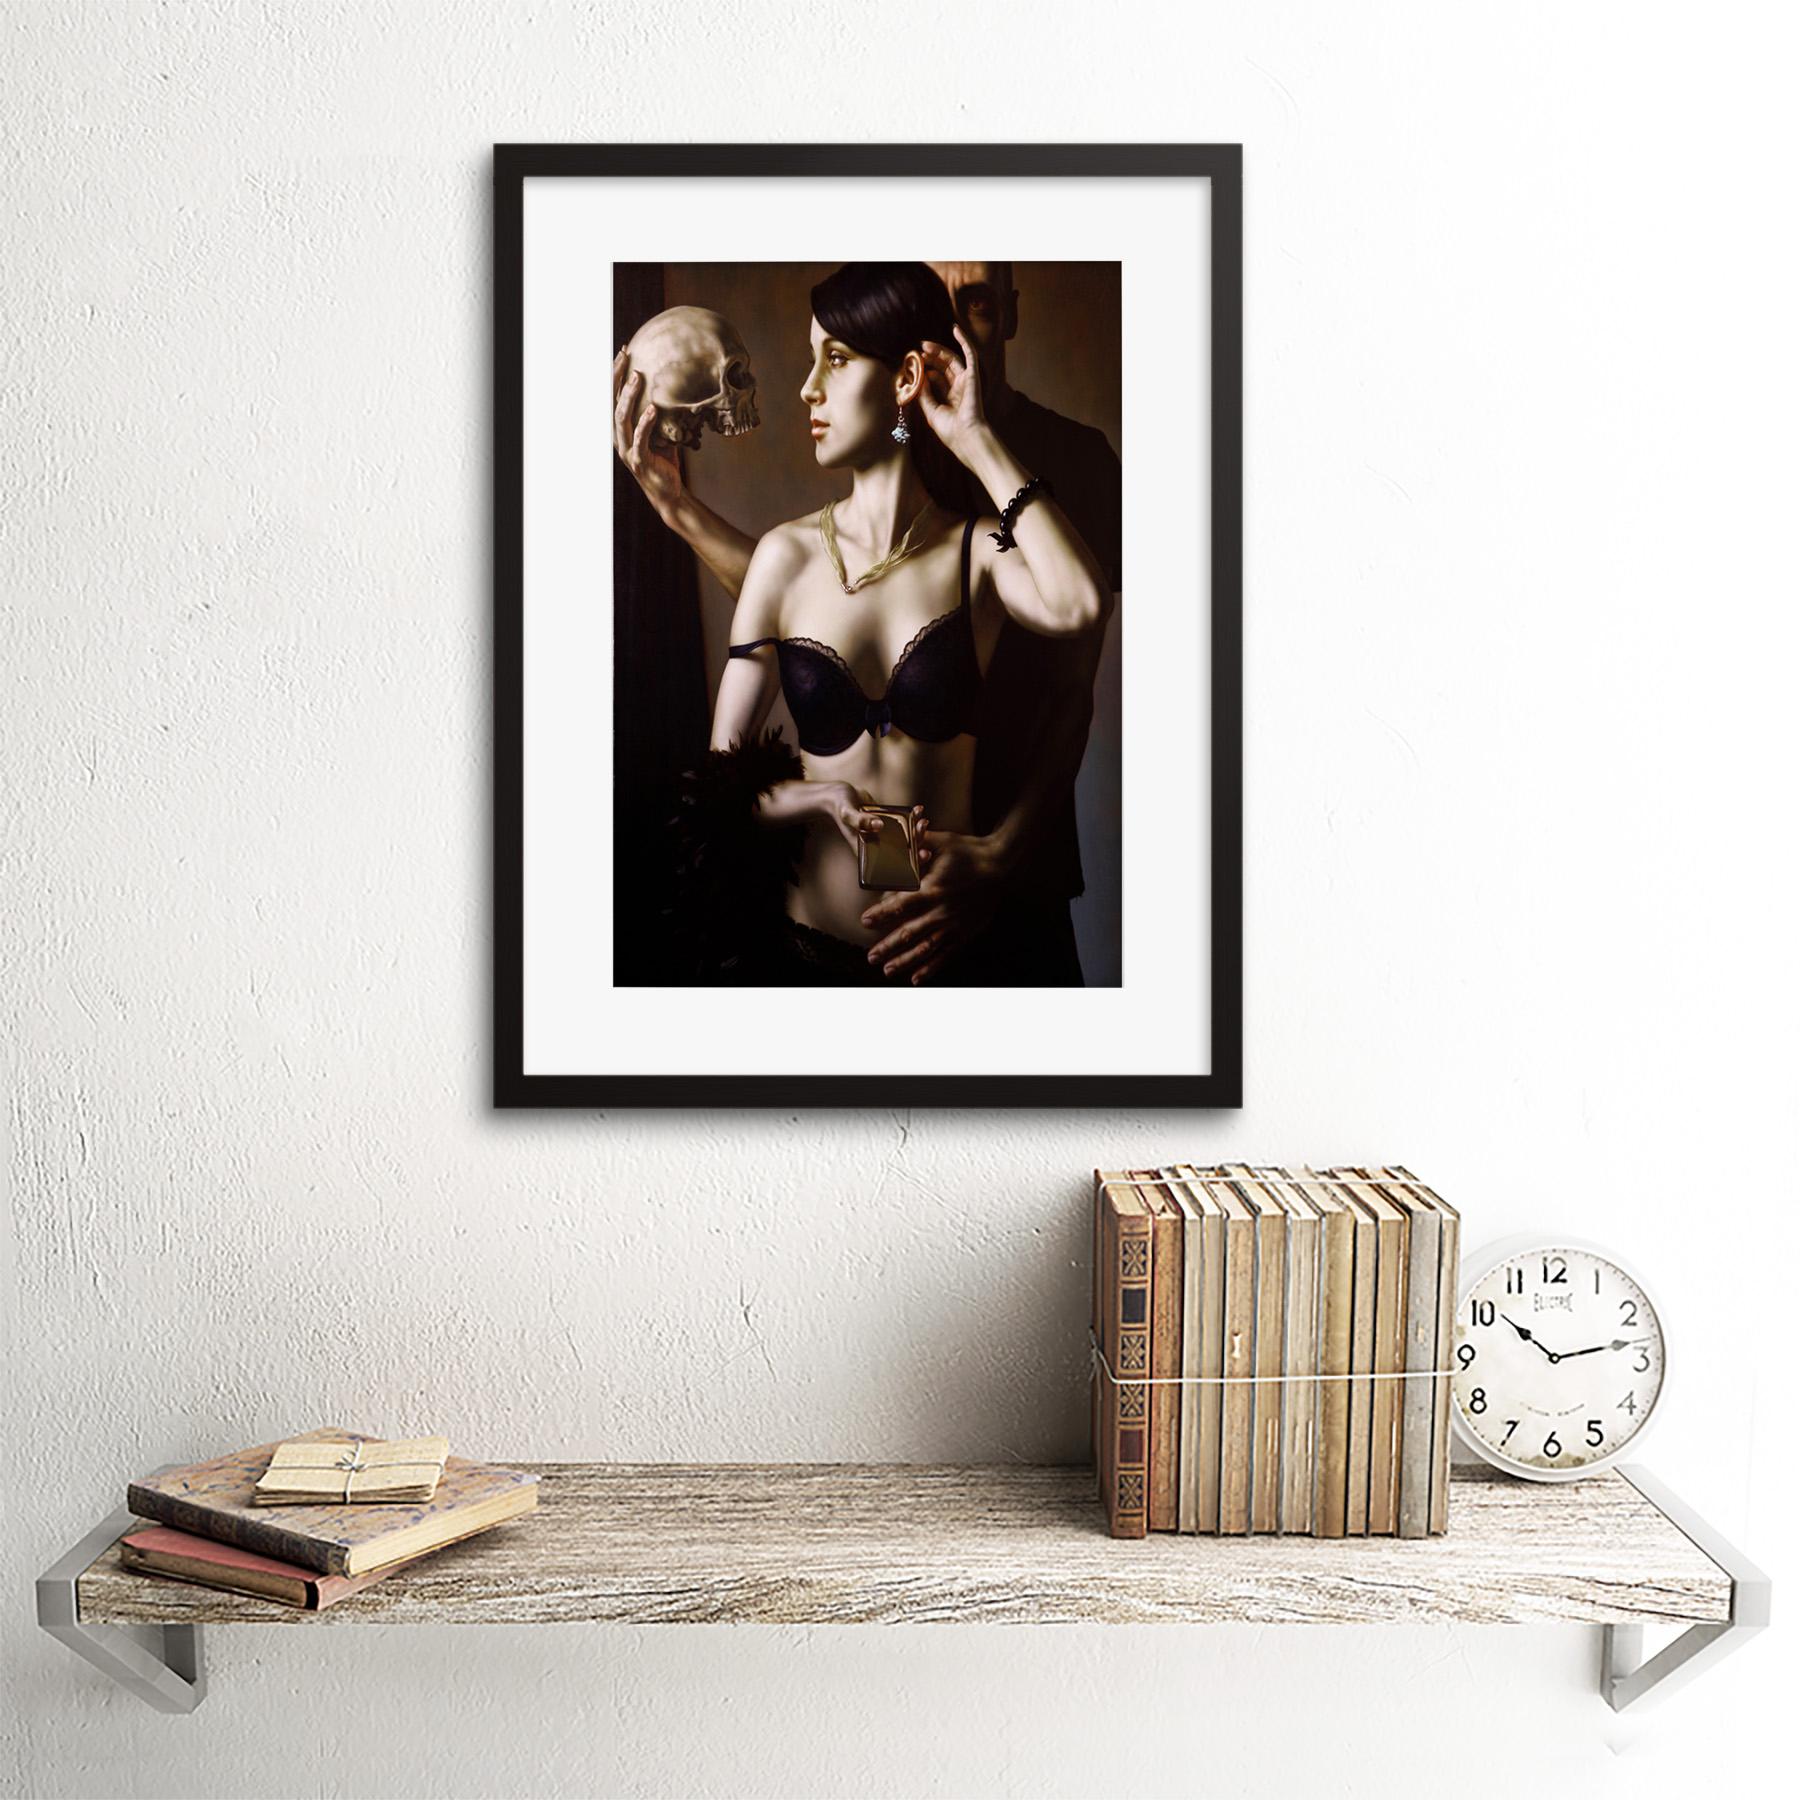 Painting-Balcar-Send-Me-To-The-Future-Framed-Art-Print-12x16-Inch 縮圖 3